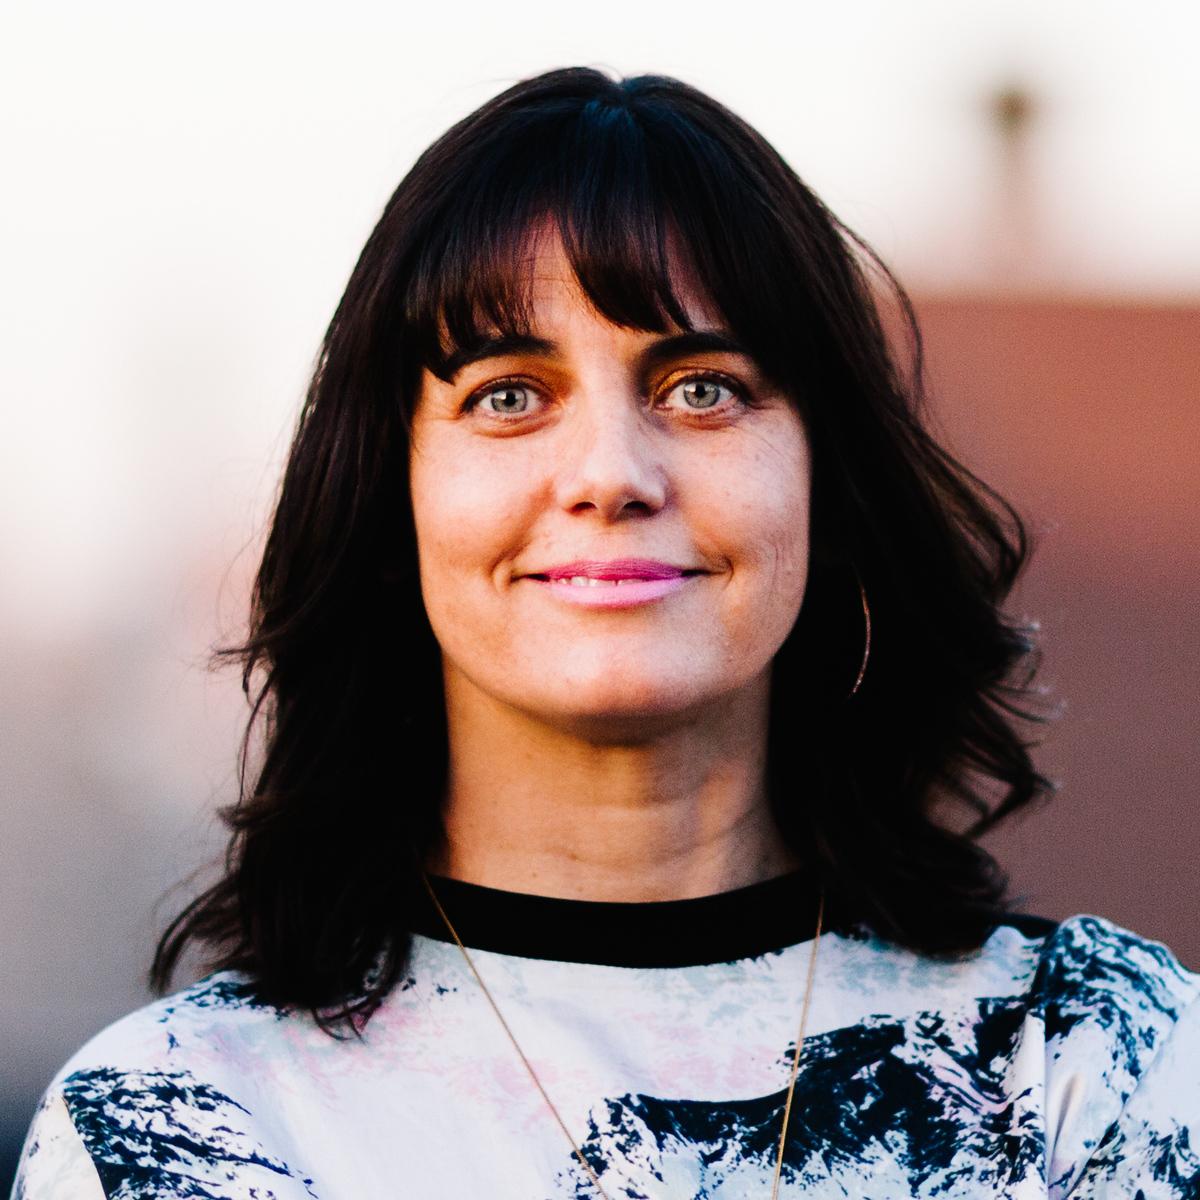 Macarena Gómez-Barris Portrait